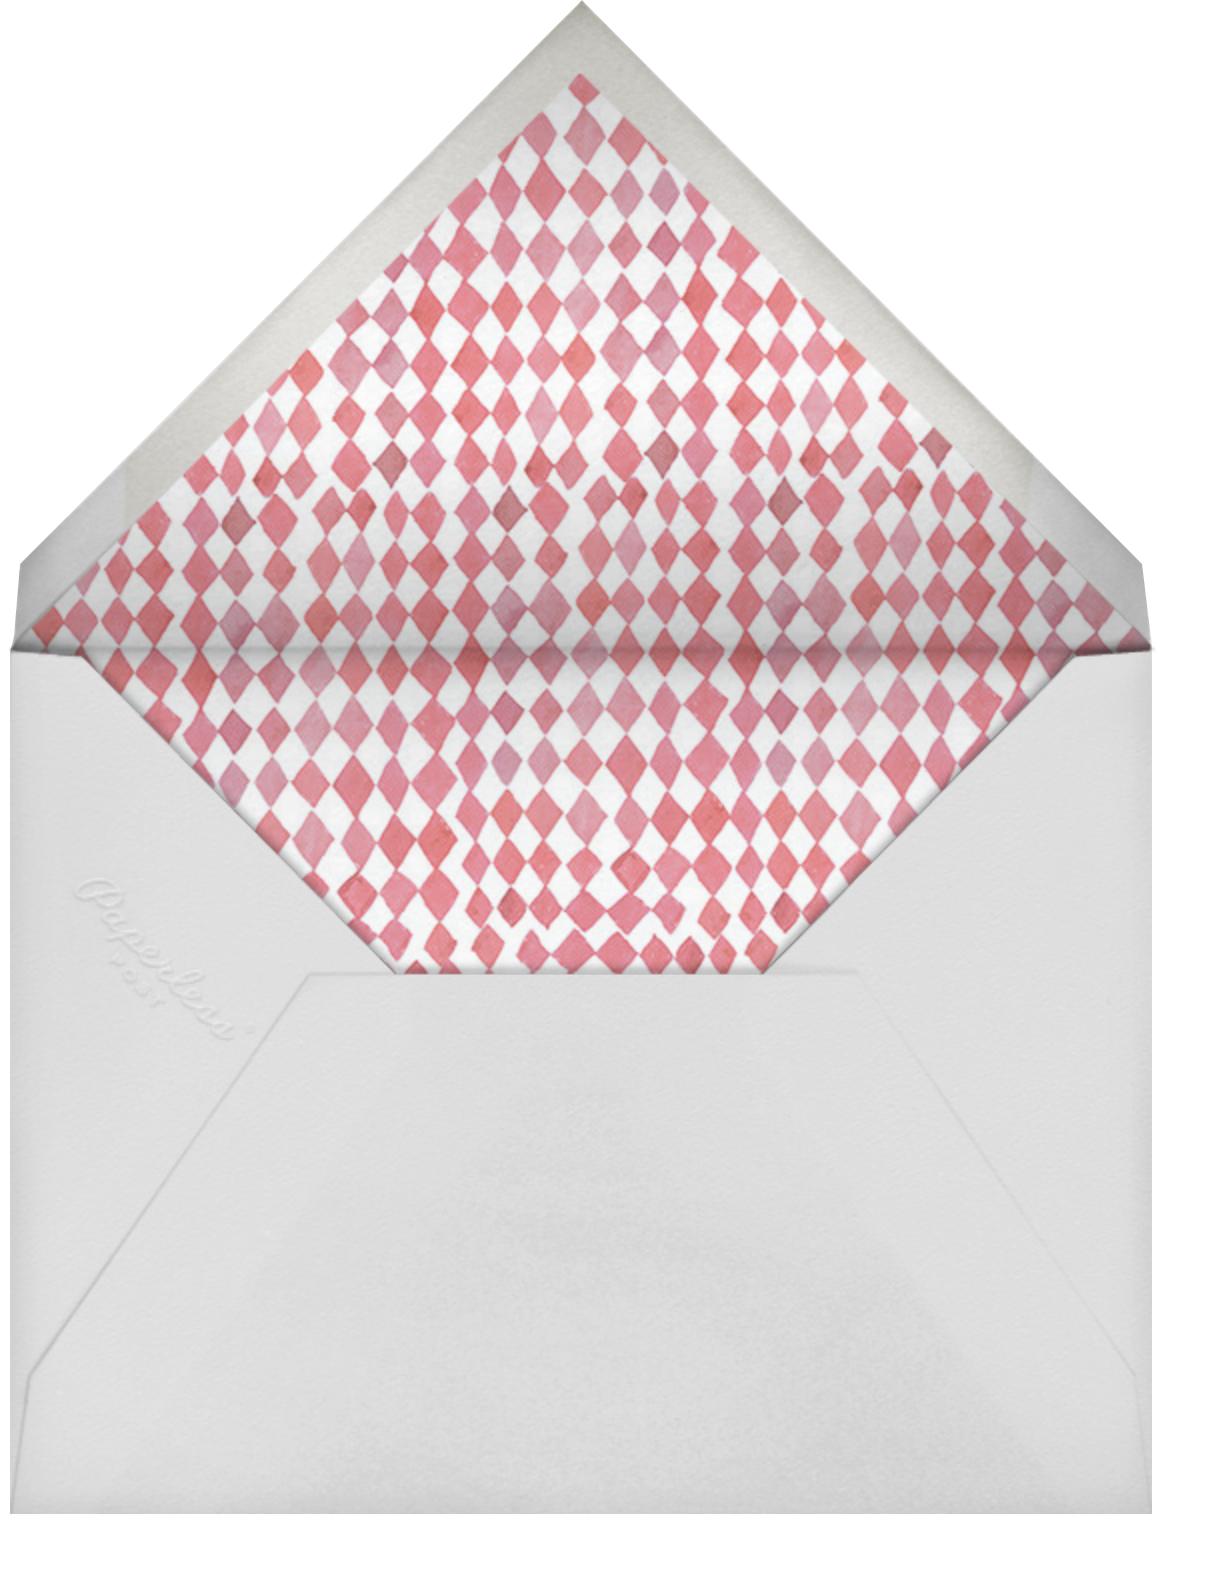 Three Tiers - Happy Menocal - Envelope